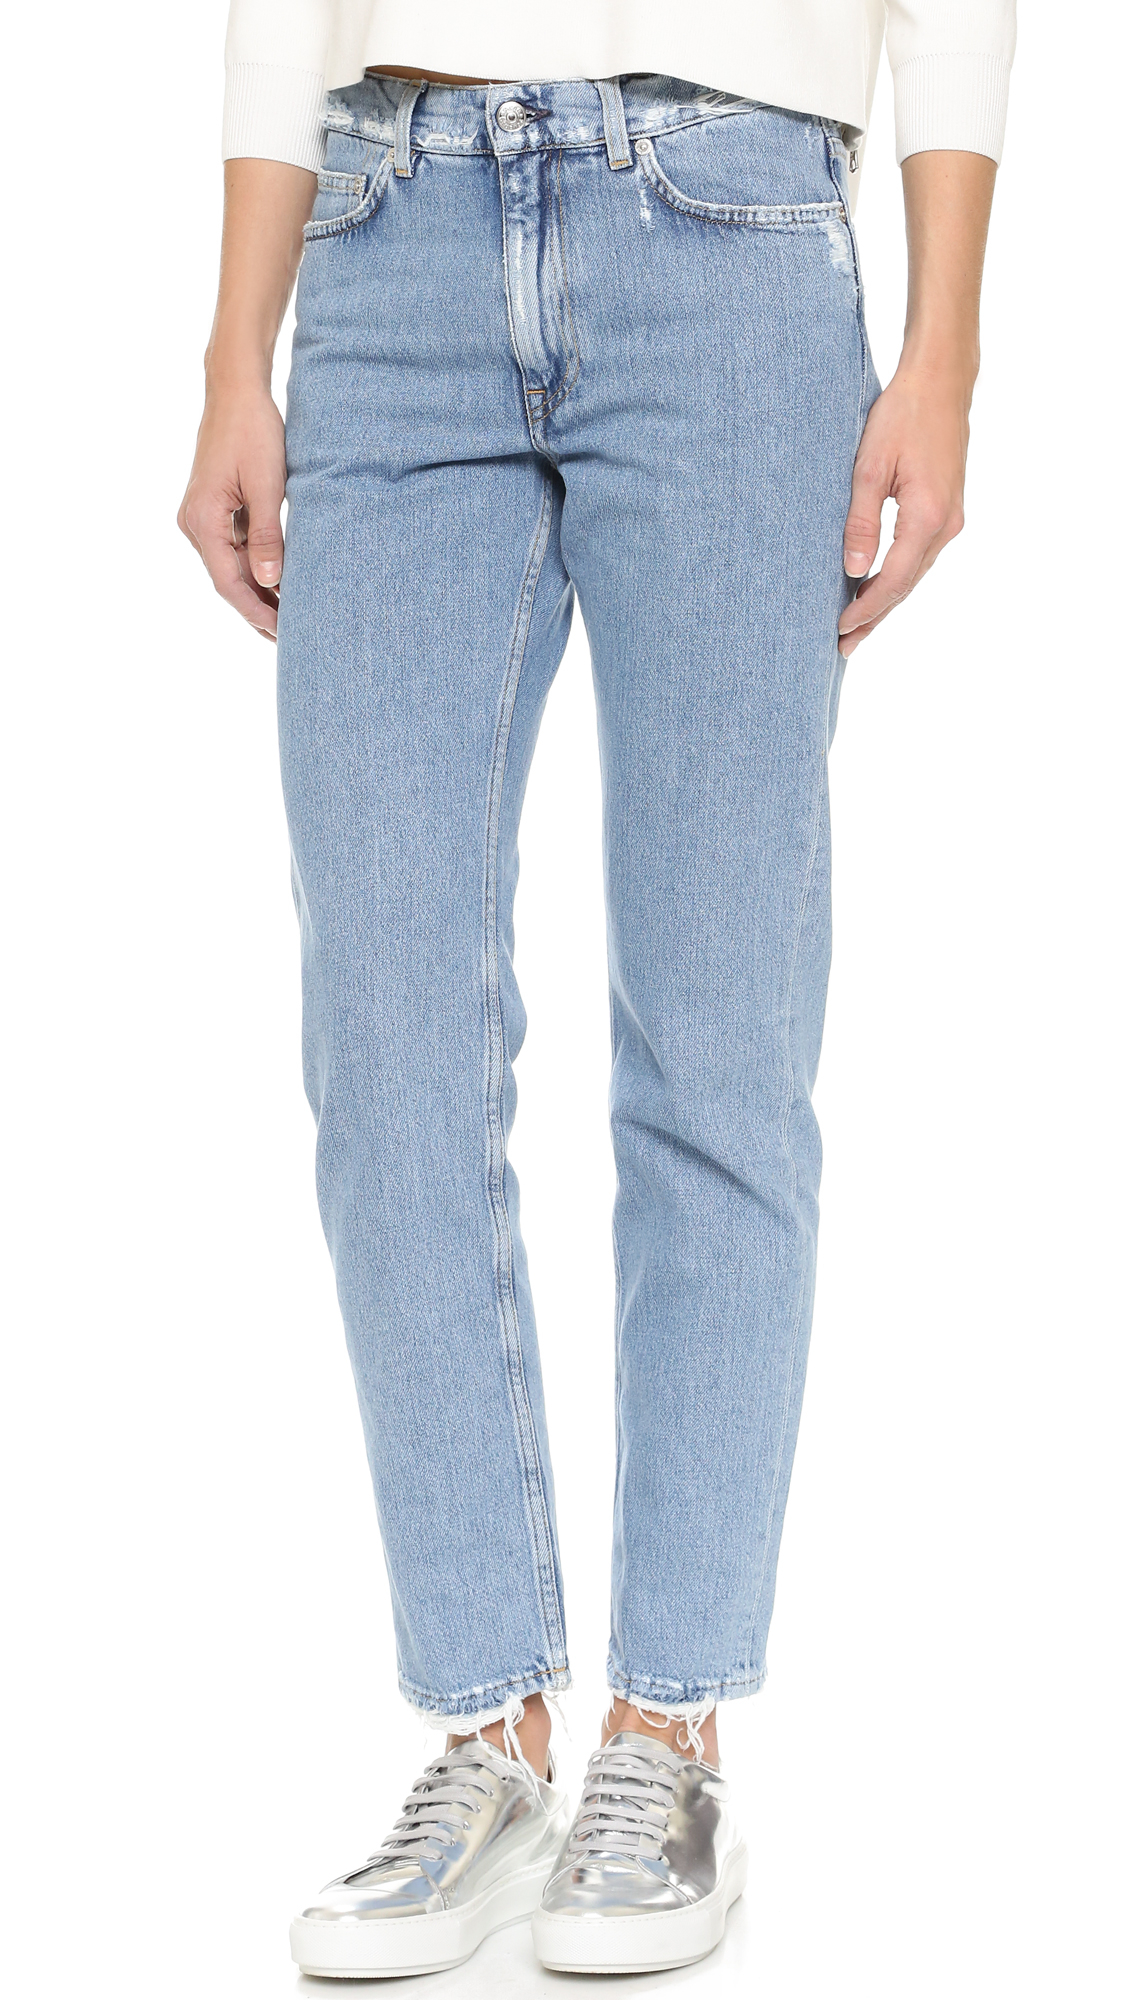 Acne studios Boy Frayed Jeans in Blue | Lyst